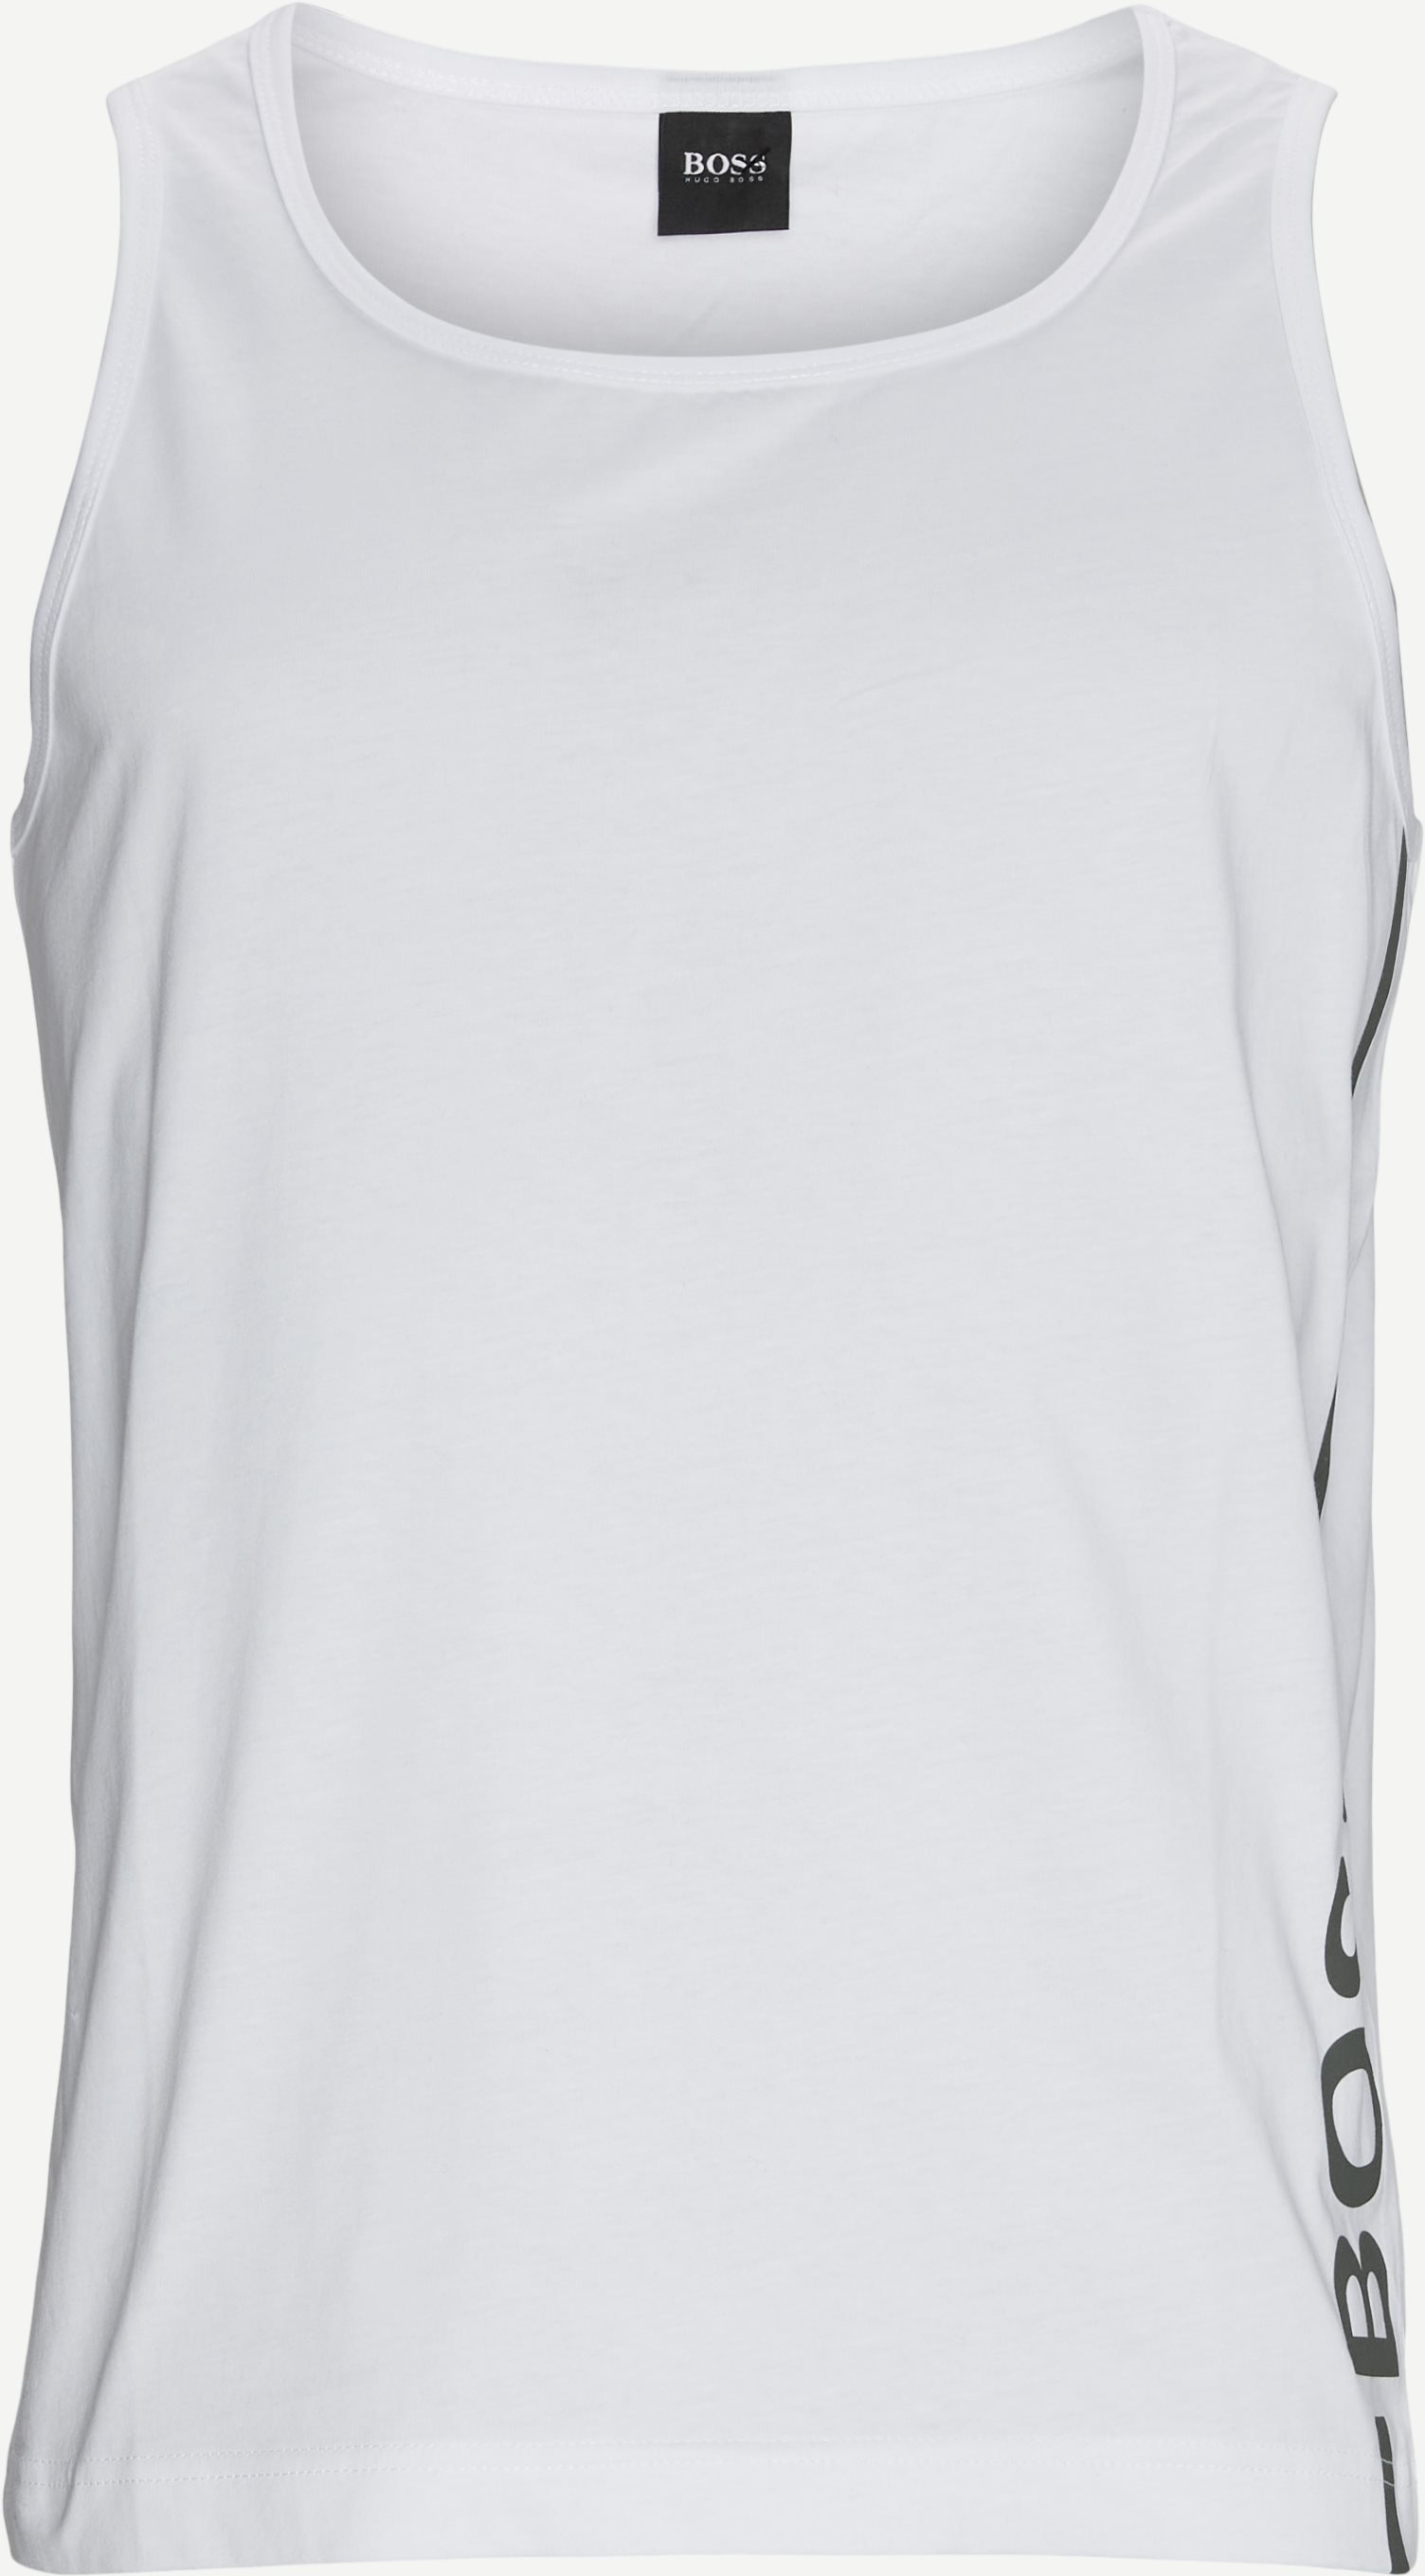 Beach Tank Top - T-shirts - Regular - White